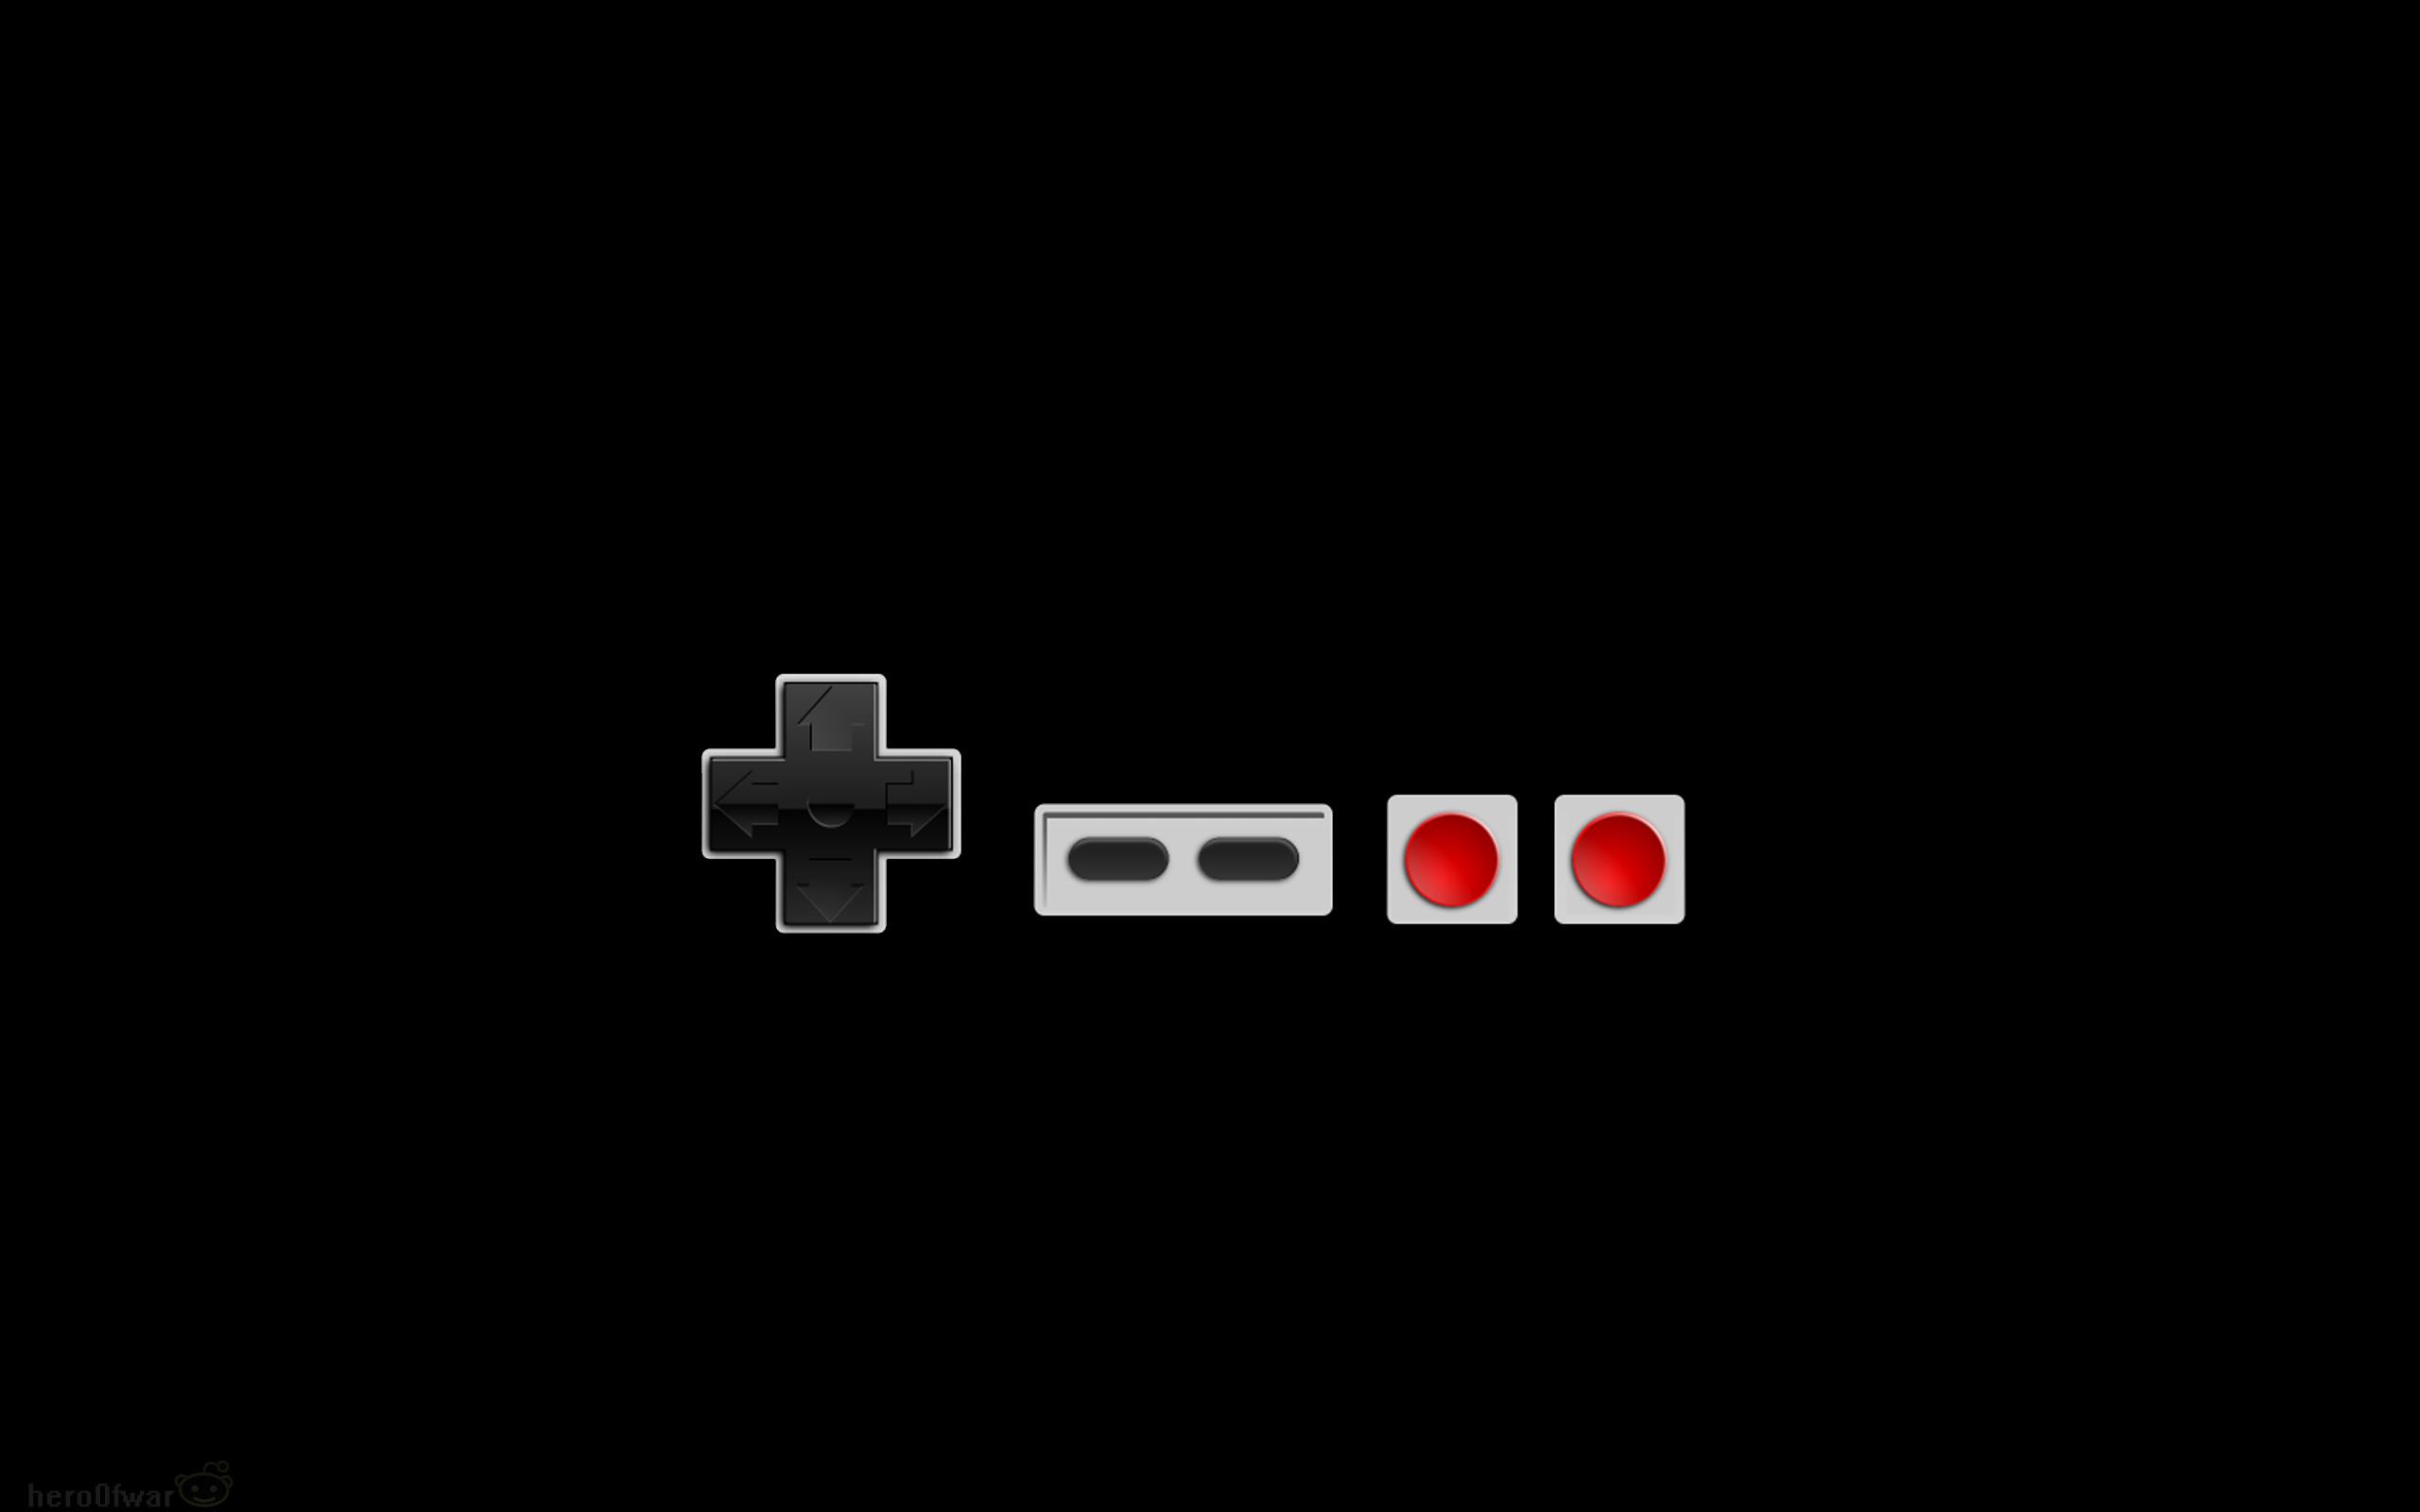 Nintendo Iphone Wallpaper HD